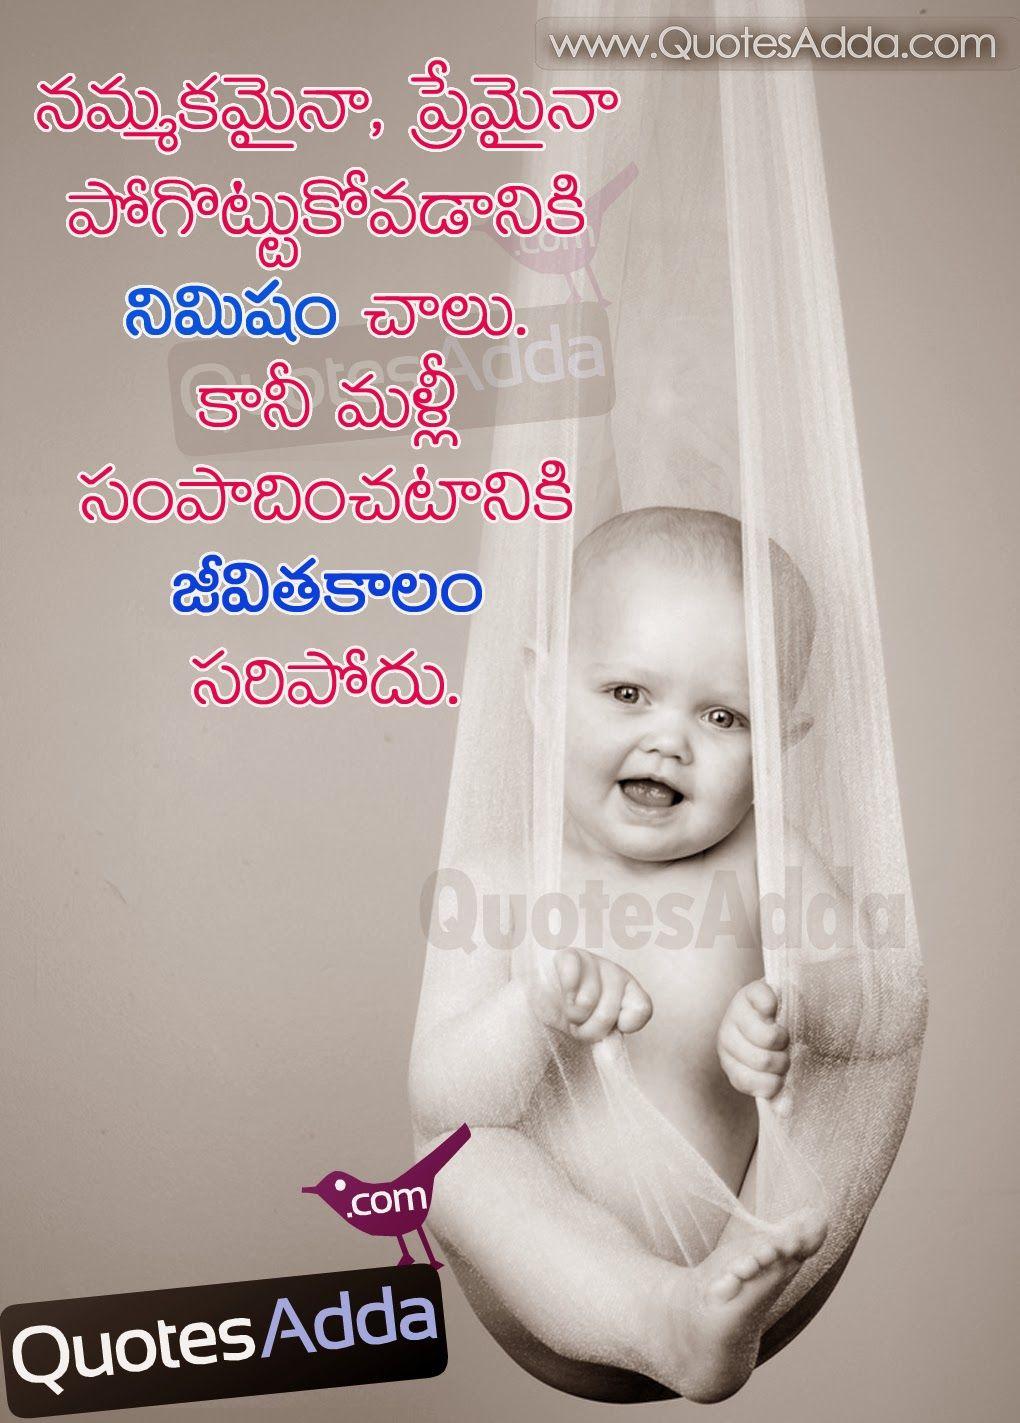 Telugu Best Trust And Love Quotations Quotesaddacom Telugu